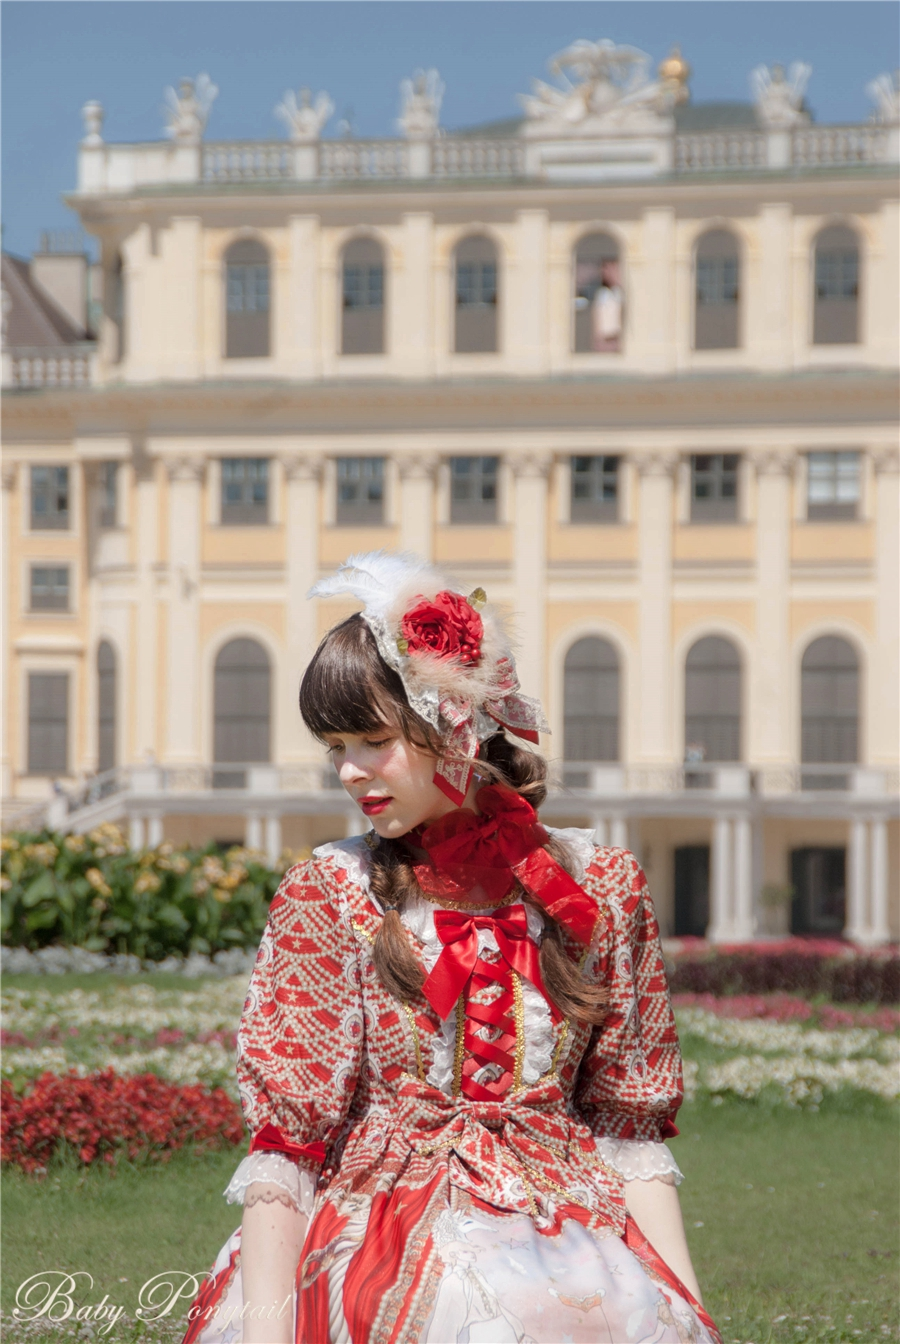 Baby Ponytail Masquerade Ballet Red OP_Claudia_09.jpg